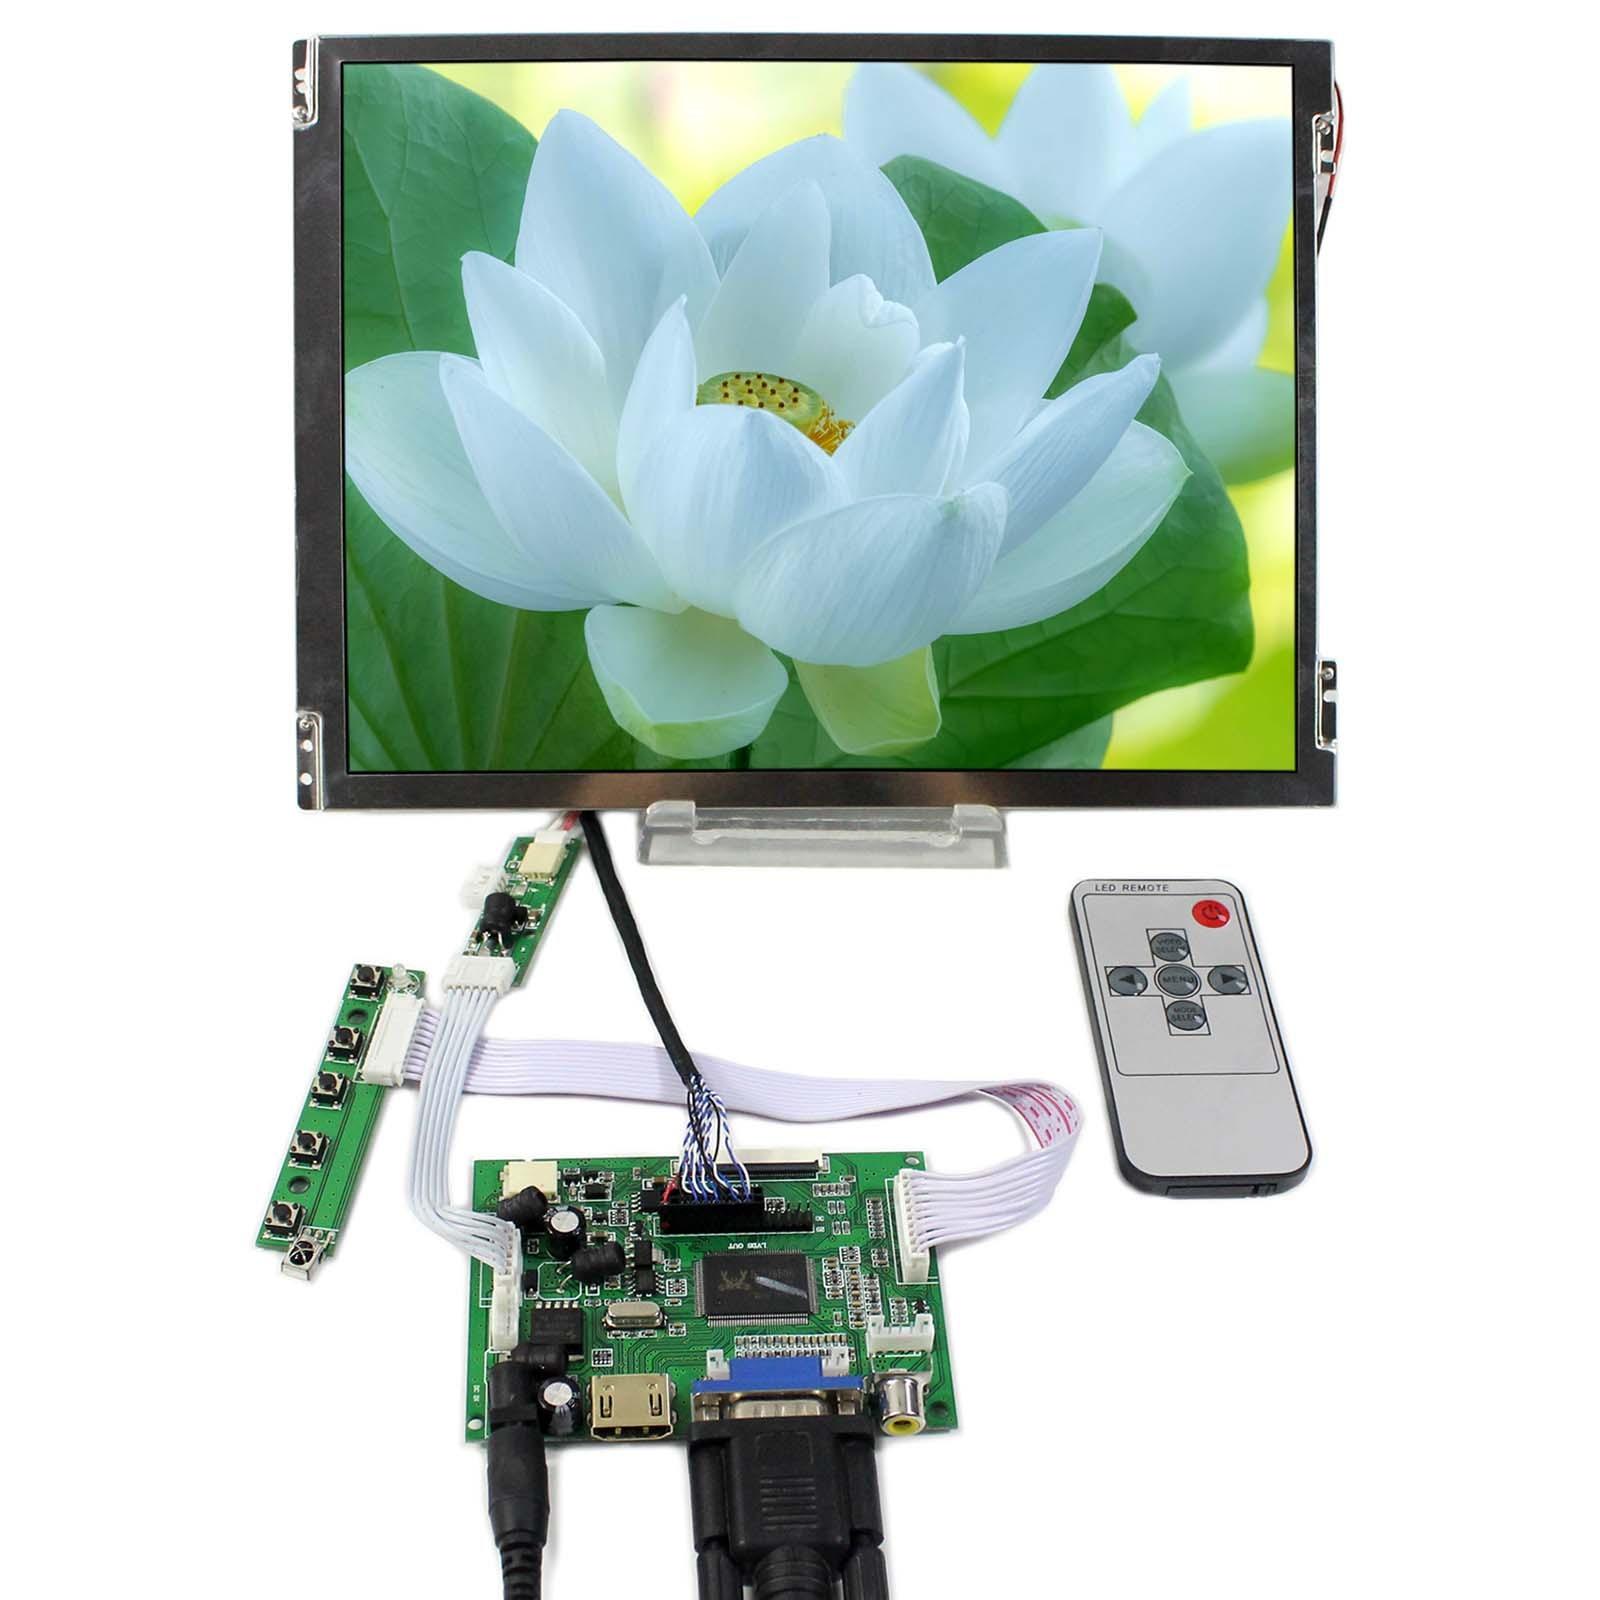 HDMI+VGA+2AV LCD Controller Board VS-TY2662-V1 With 10.4inch 800x600 TM104SDH01 LCD Screen цена и фото